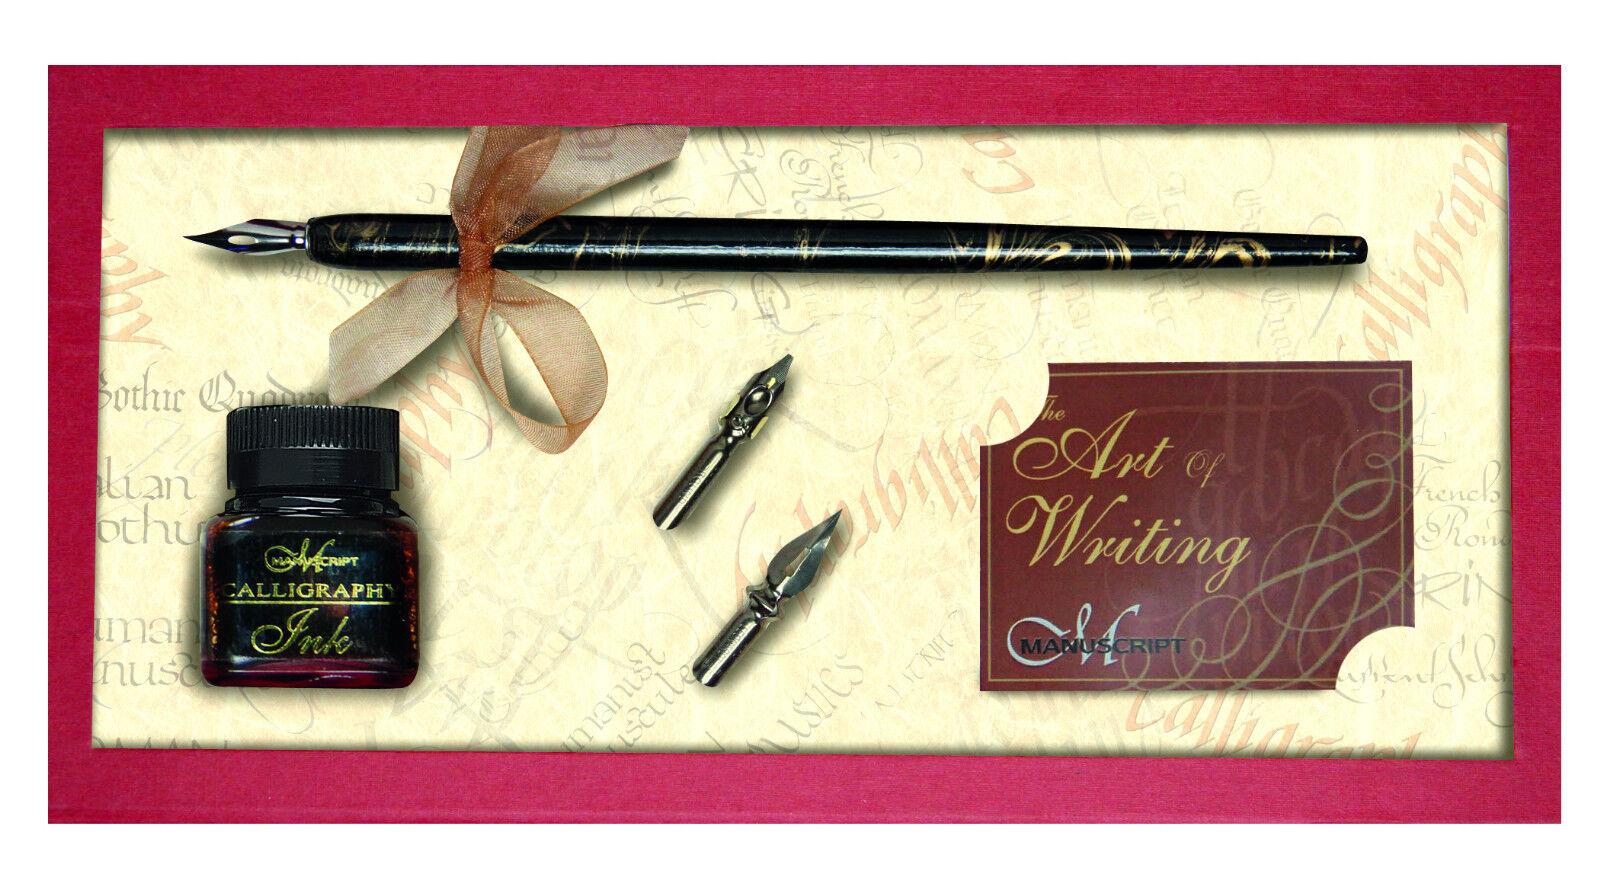 Manuscript Deluxe Dip Pen Calligraphy Writing Gift Set